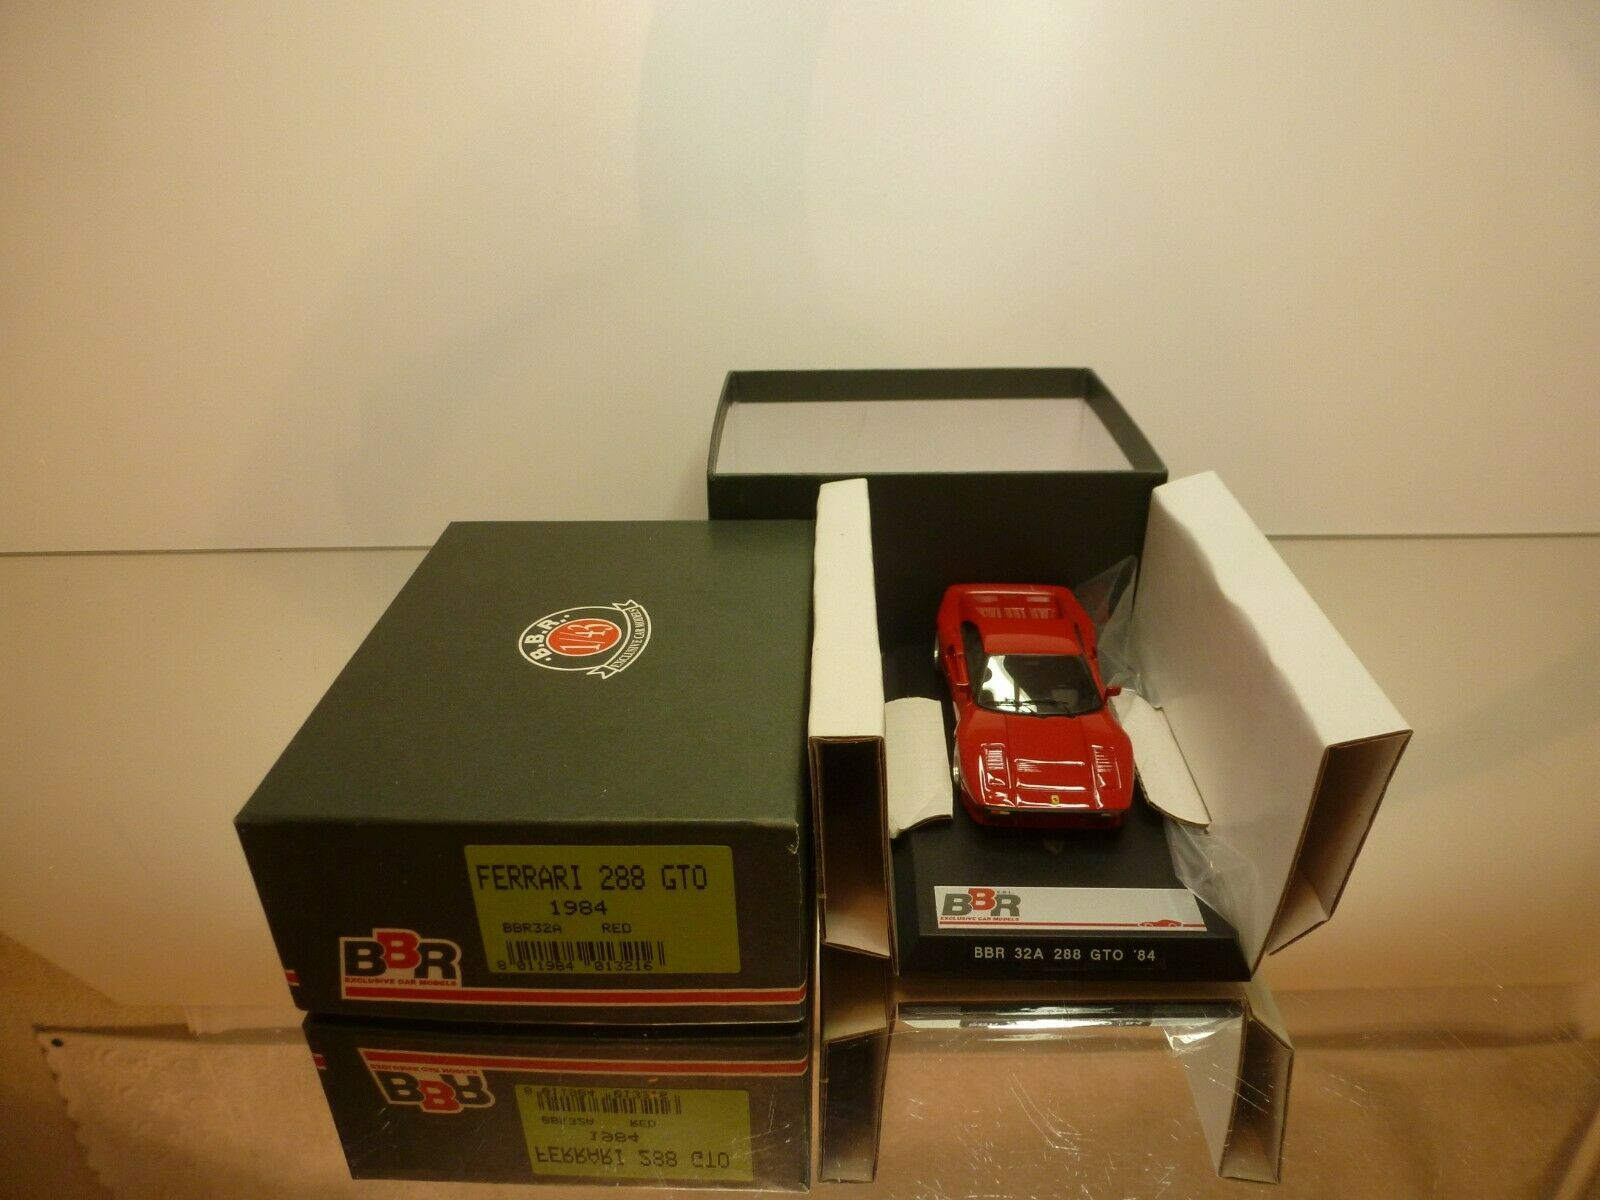 BBR BBR32A FERRARI 288 GTO 1984 - RED  1:43 - EXCELLENT IN BOX